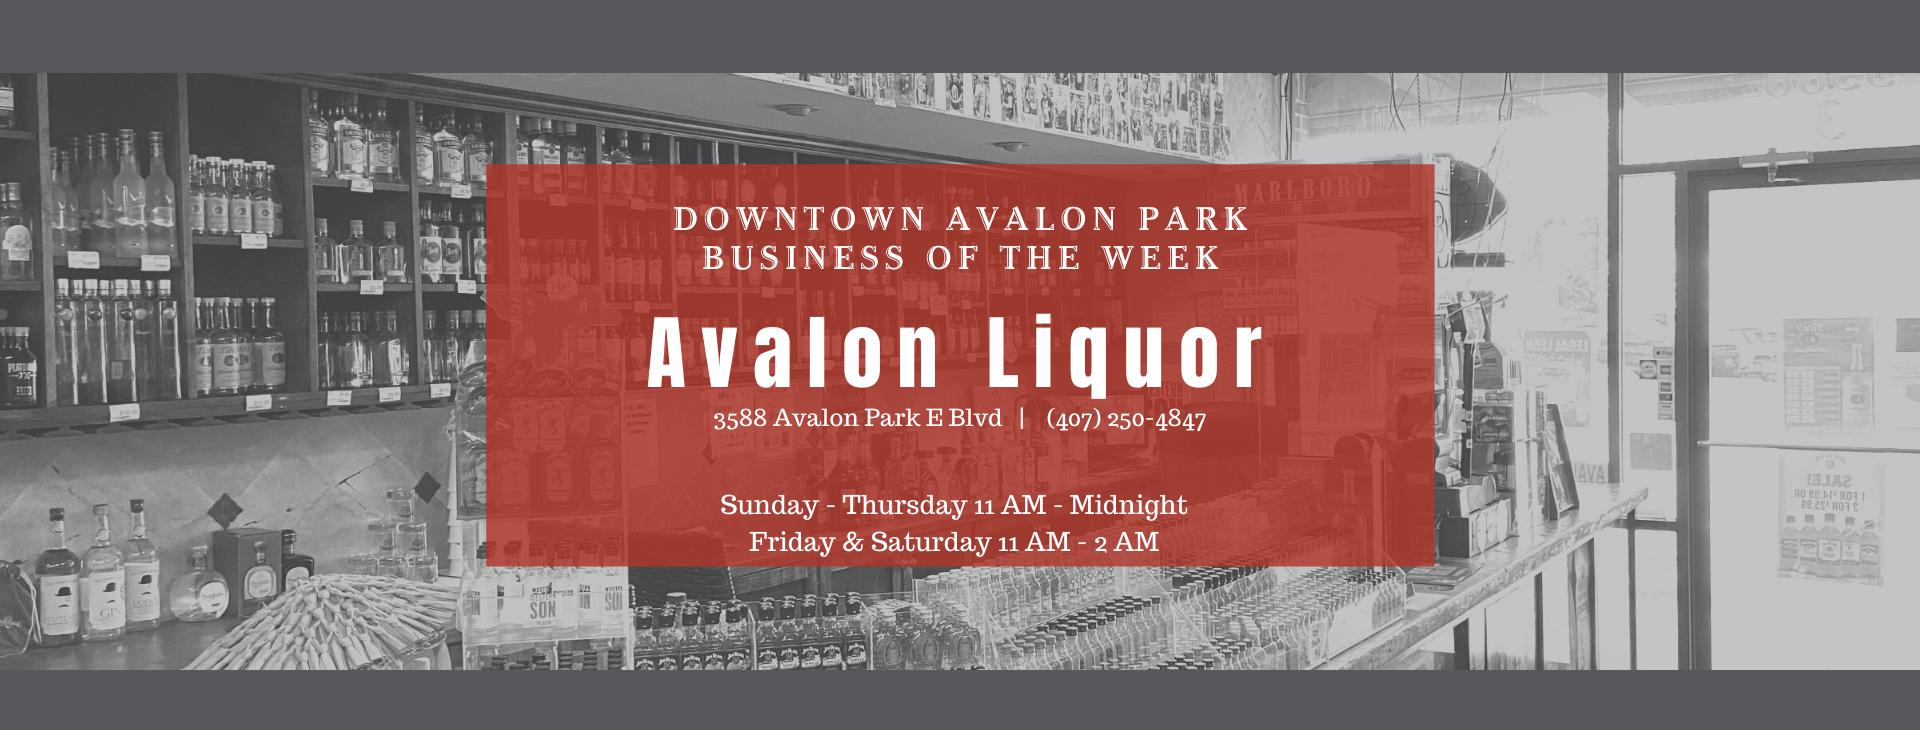 Avalon Liquor FB Header